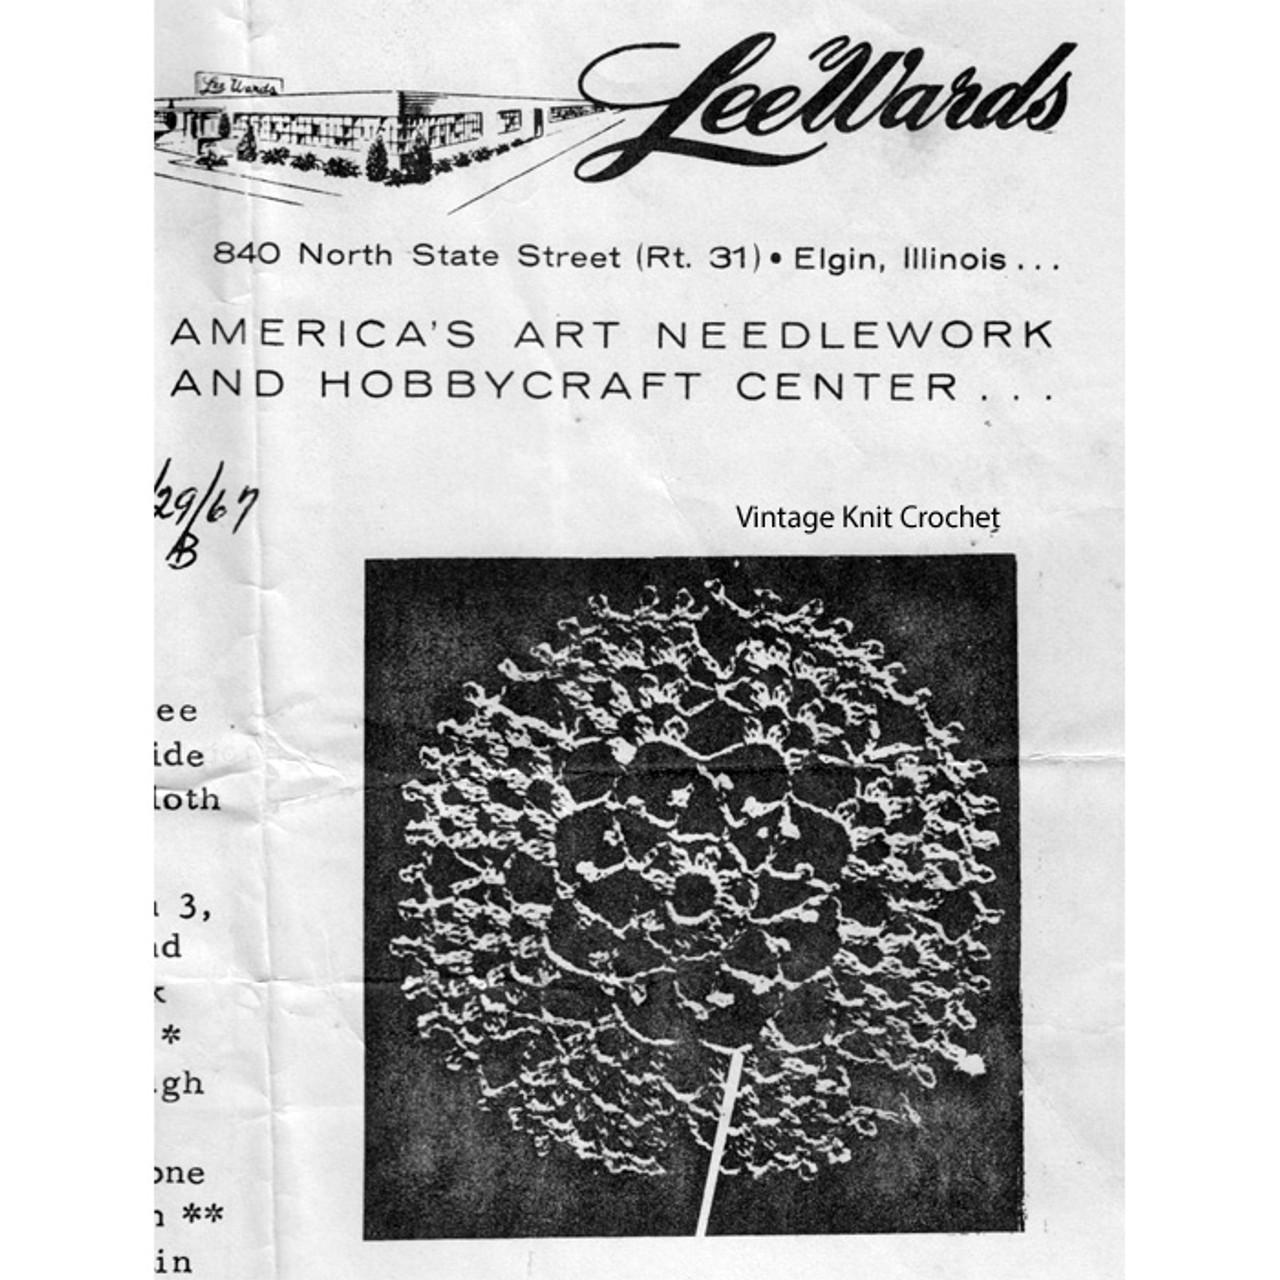 Leewards Crochet Chrysanthemum Tablecloth Pattern